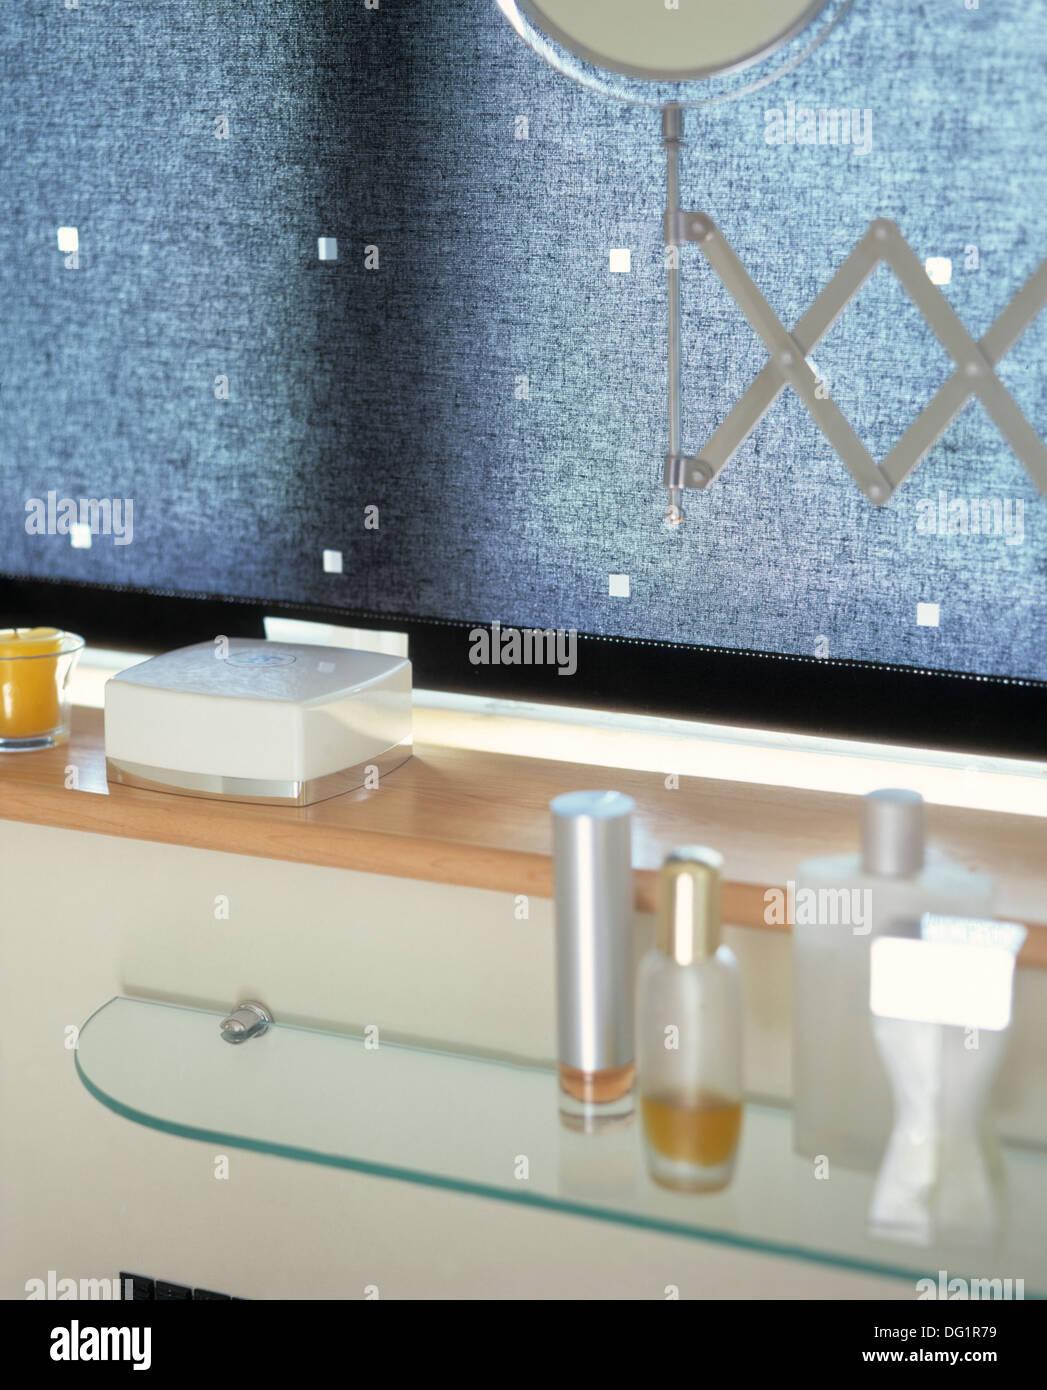 Close-up of glass bottles of toiletries on glass shelf below shelf ...